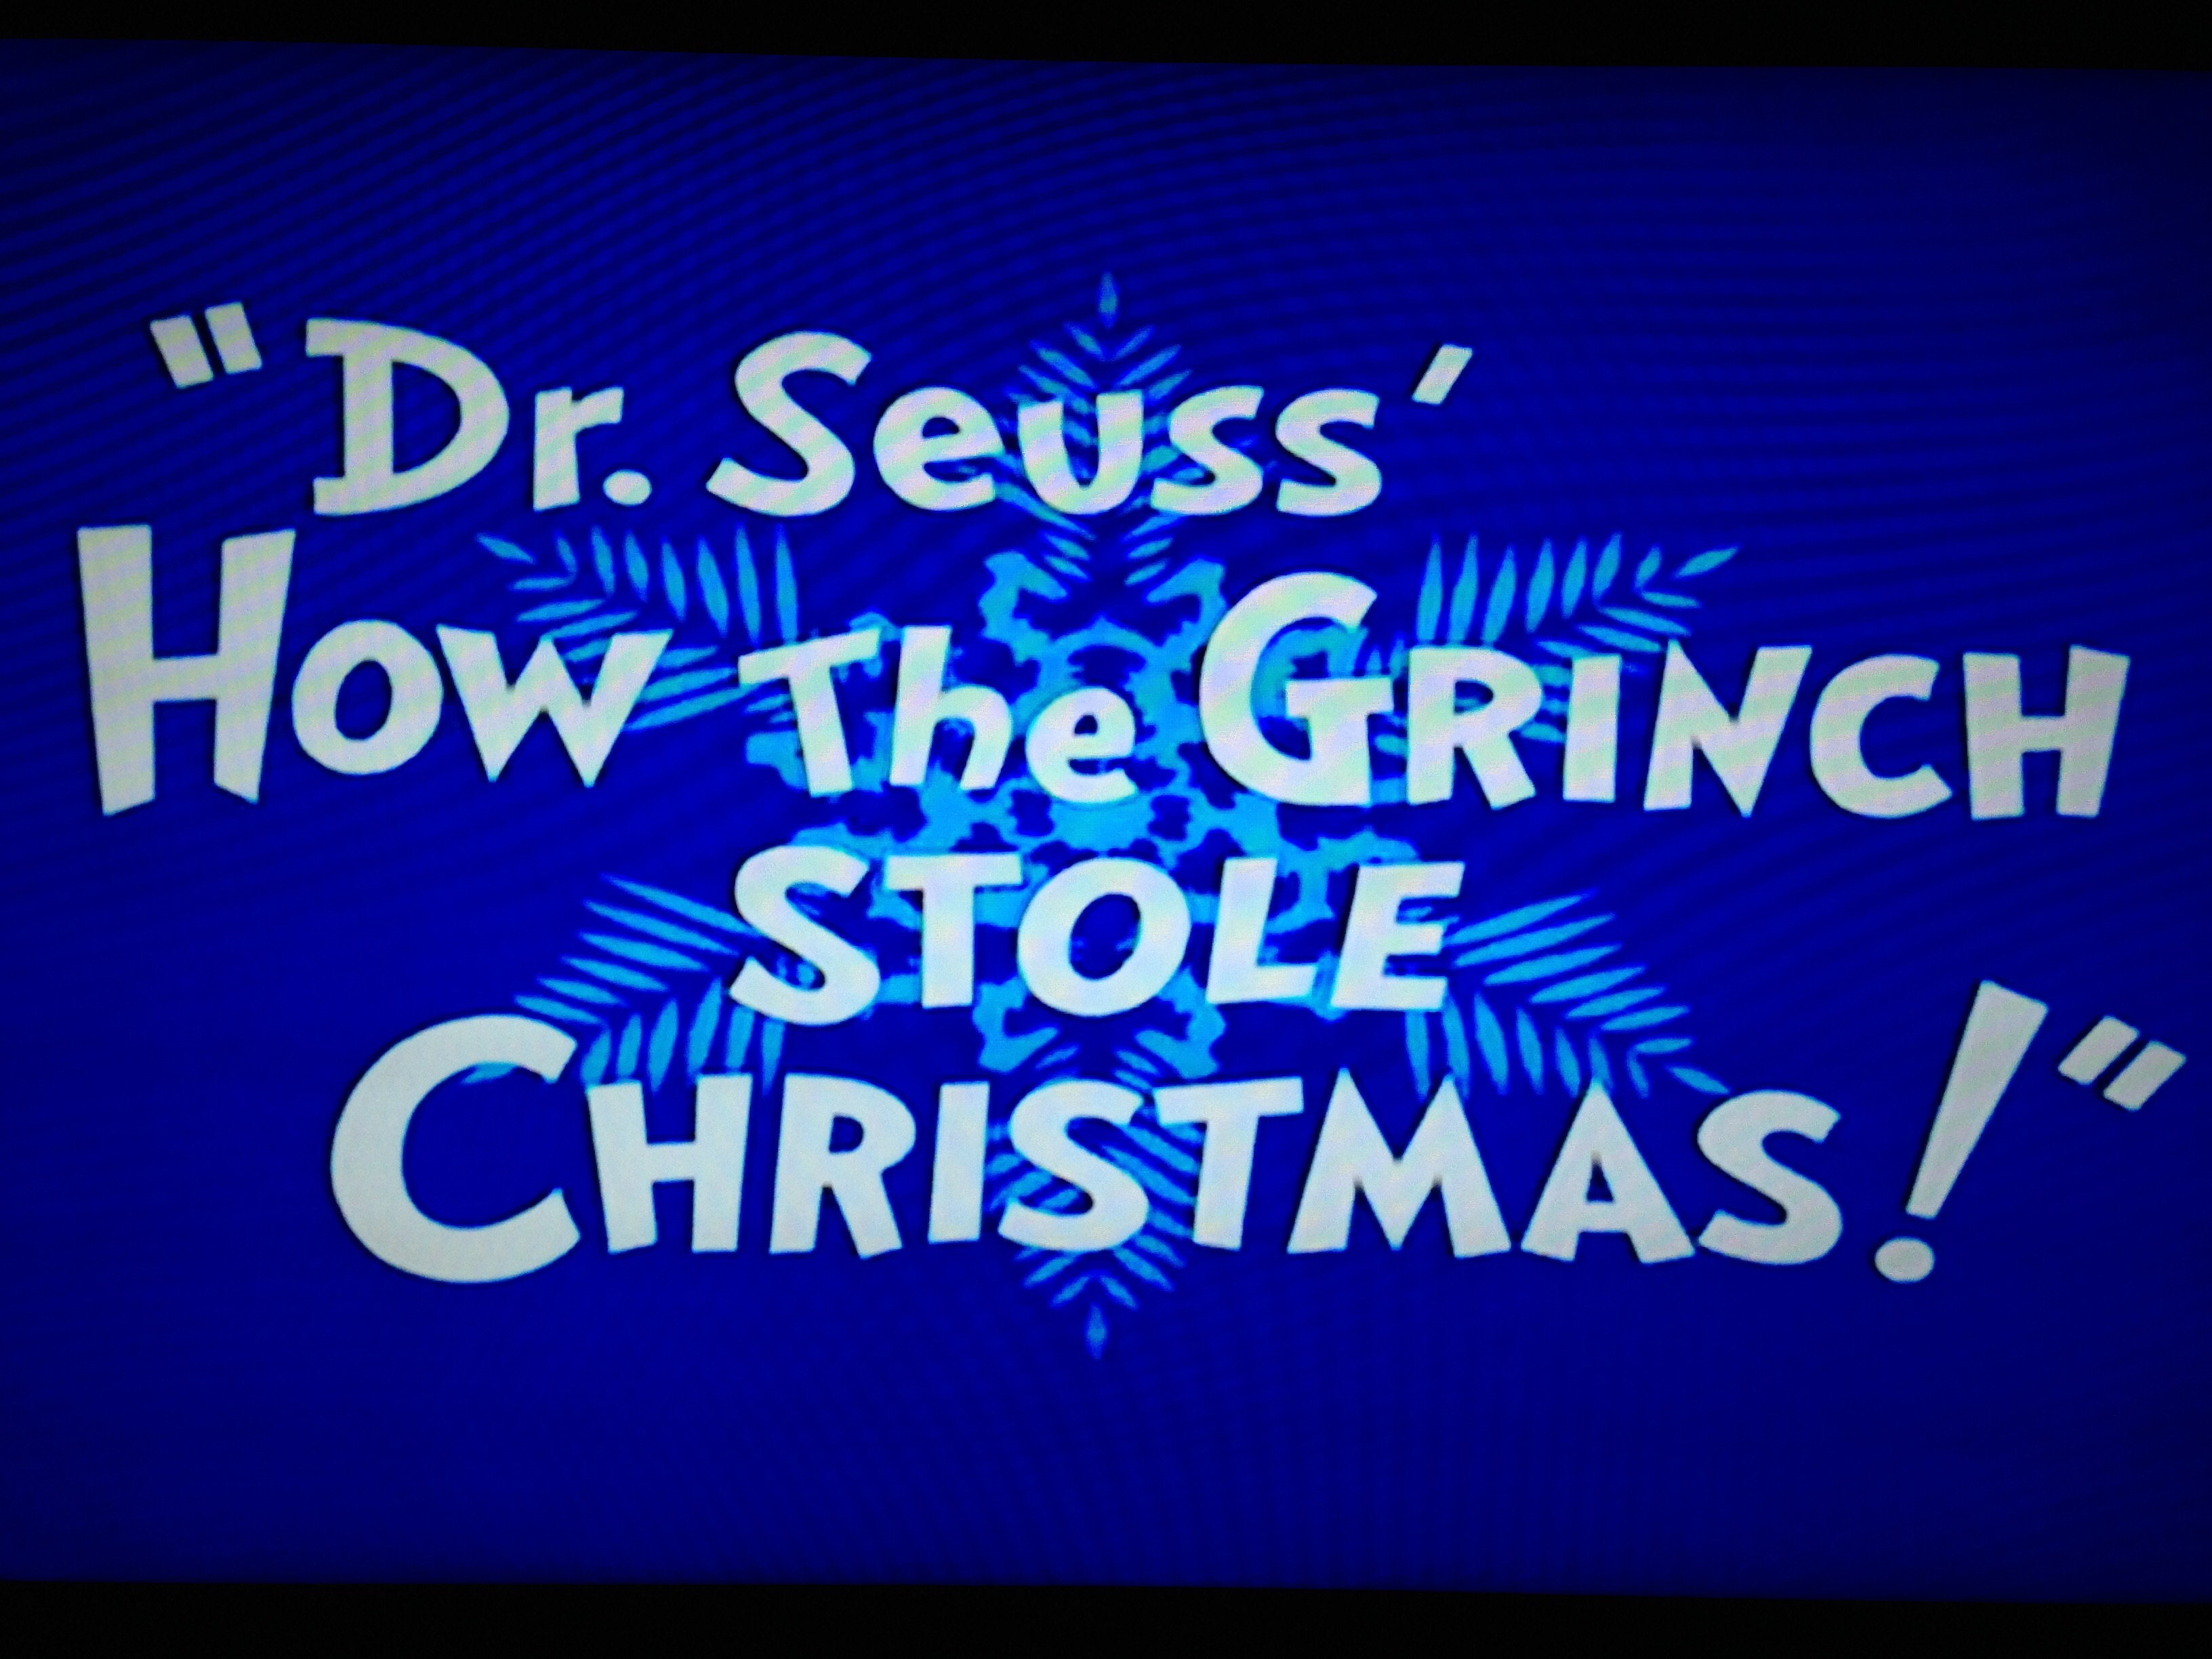 Dr. Seuss' How the Grinch Stole Christmas! | Gay Geek Gab